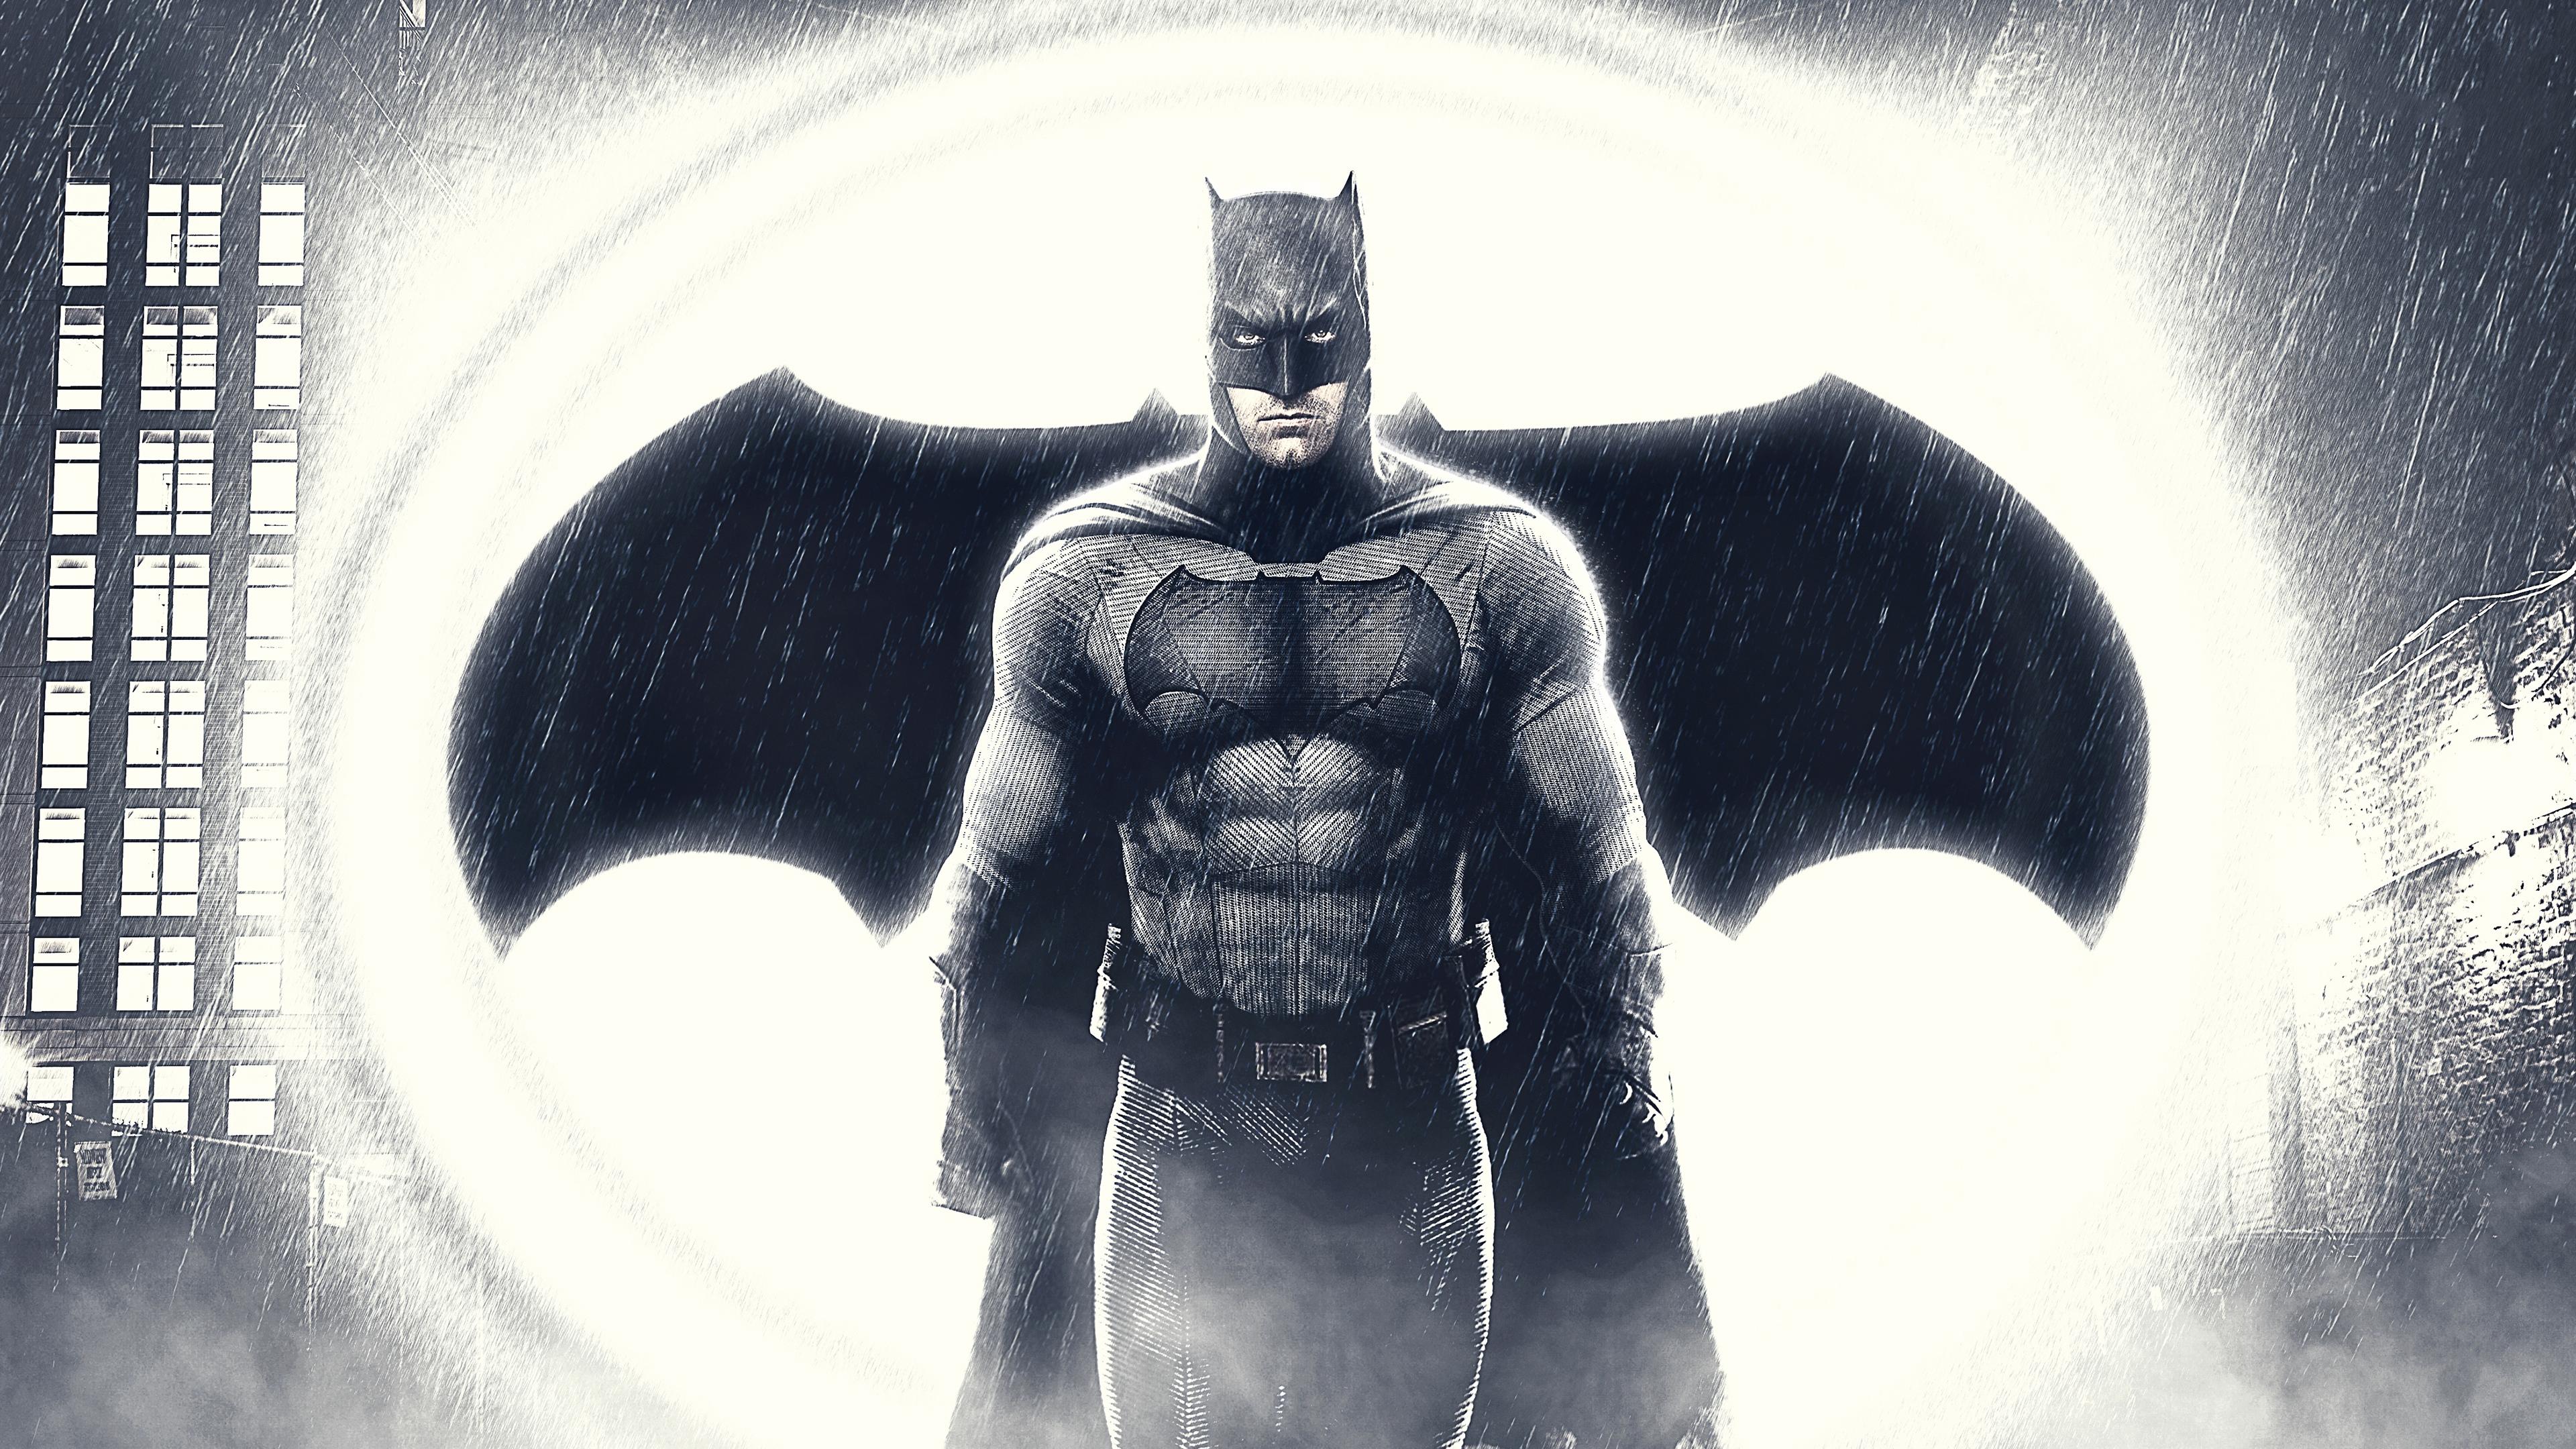 art batman 1562105069 - Art Batman - superheroes wallpapers, hd-wallpapers, digital art wallpapers, behance wallpapers, batman wallpapers, artwork wallpapers, 4k-wallpapers